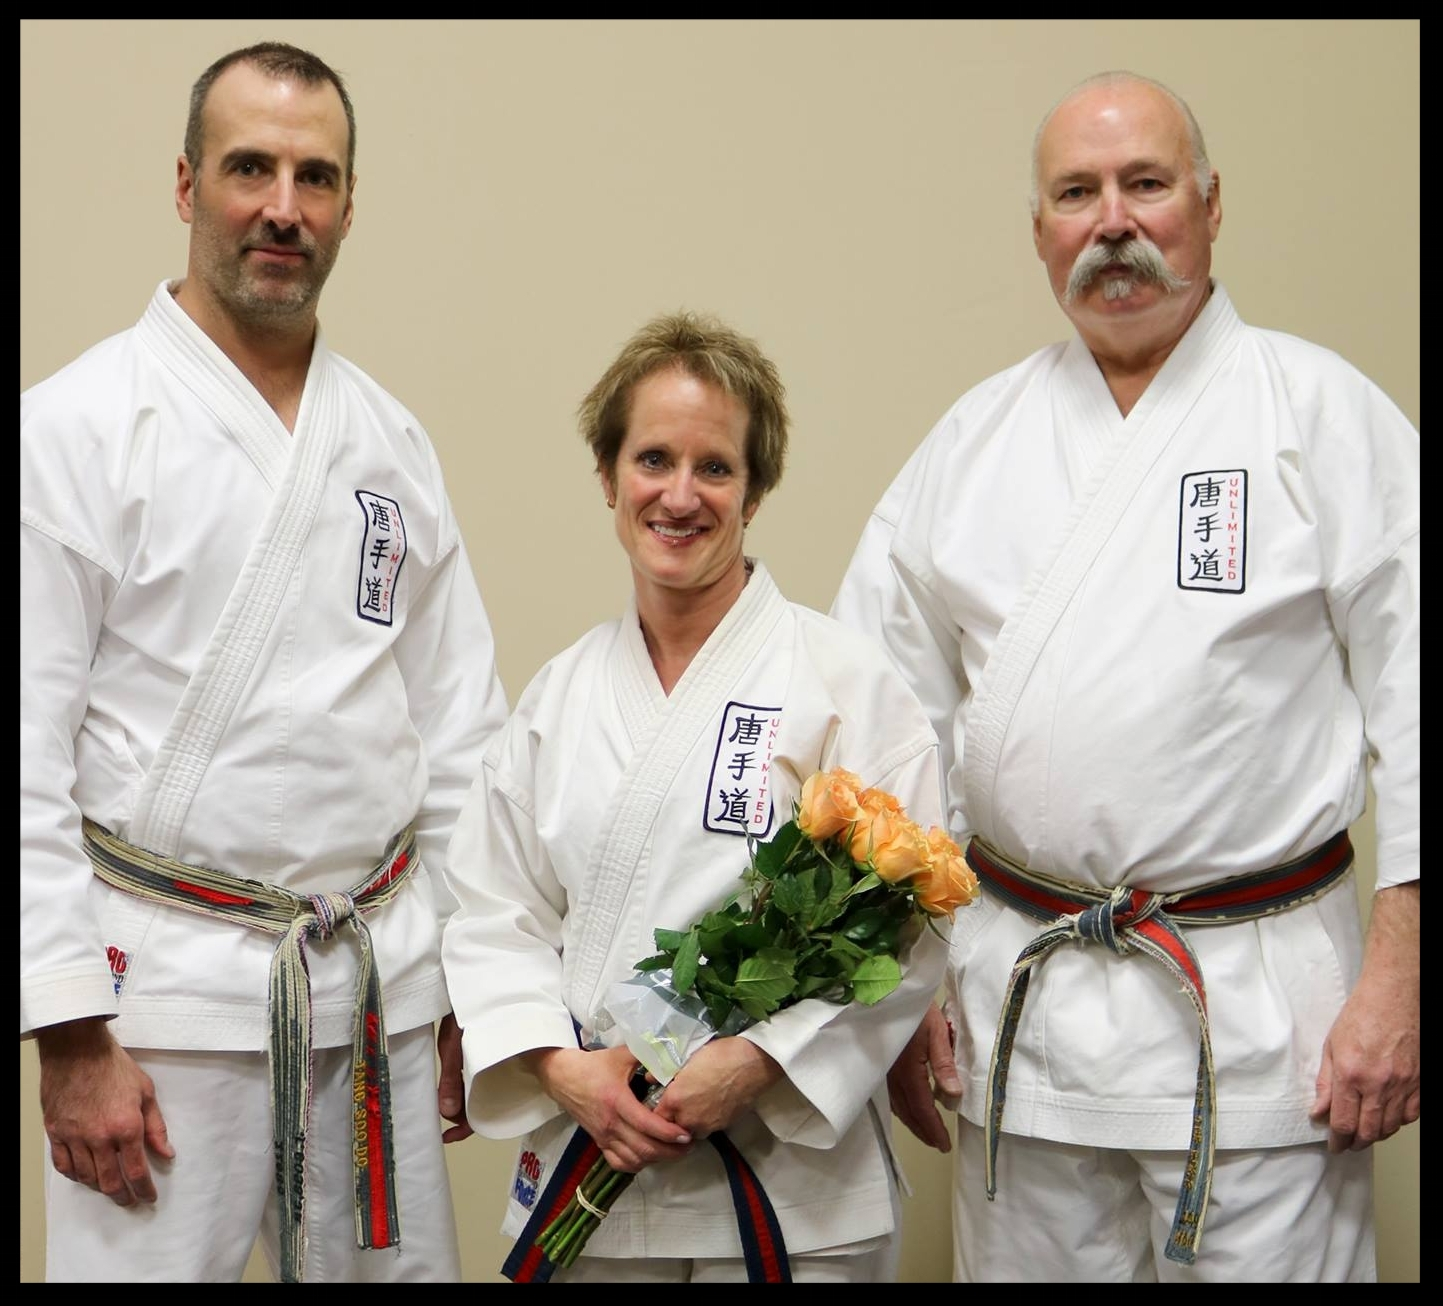 Master Joe Goss Jr., Master Karen Jones, and Master Joe Goss Sr.